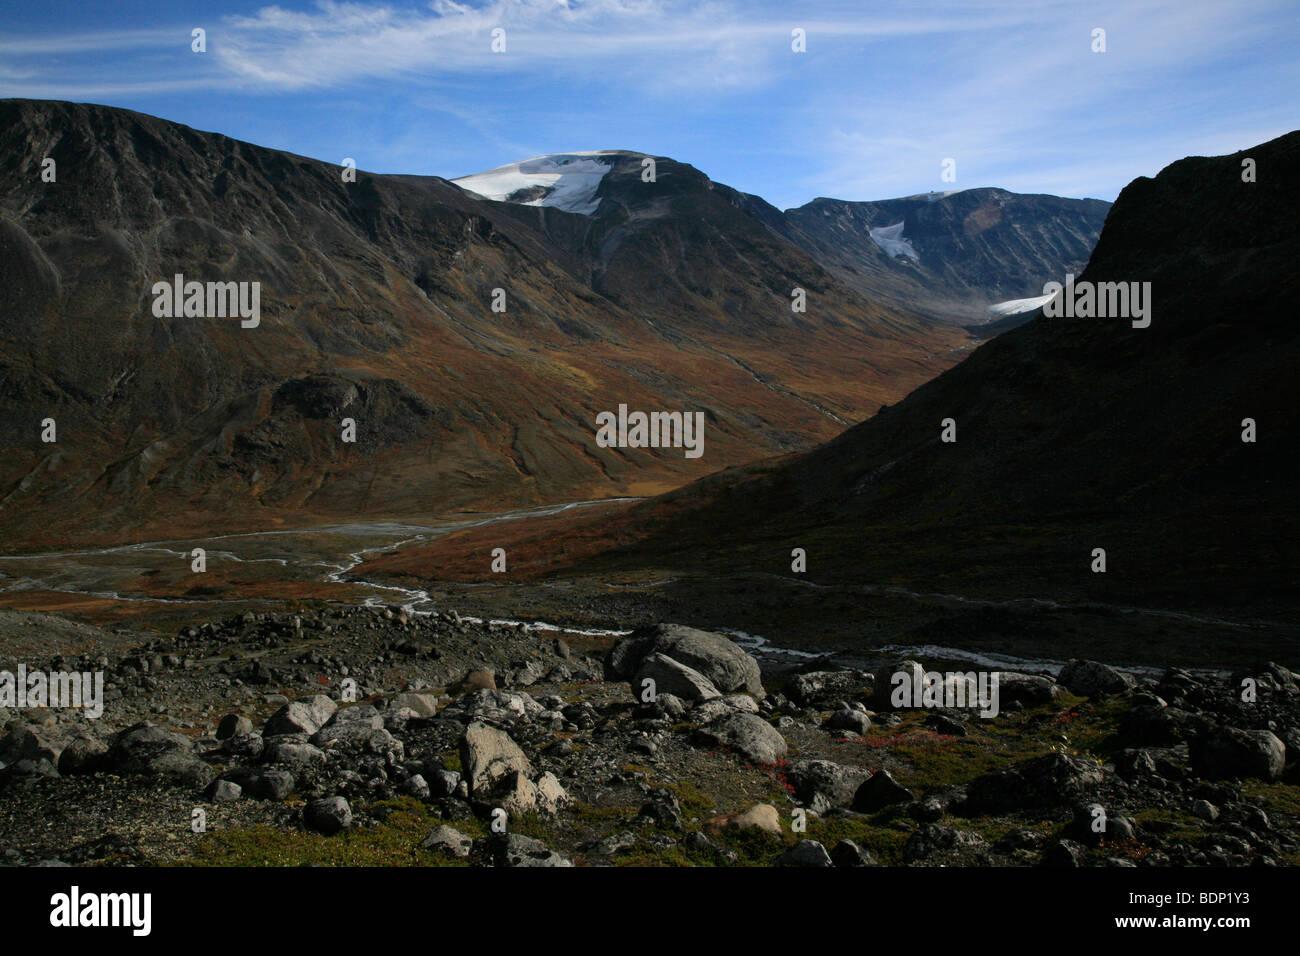 Visdalen Valley from Galdhøpiggen path in the Jotunheimen National Park, Oppland, Norway, Scandinavia, North - Stock Image